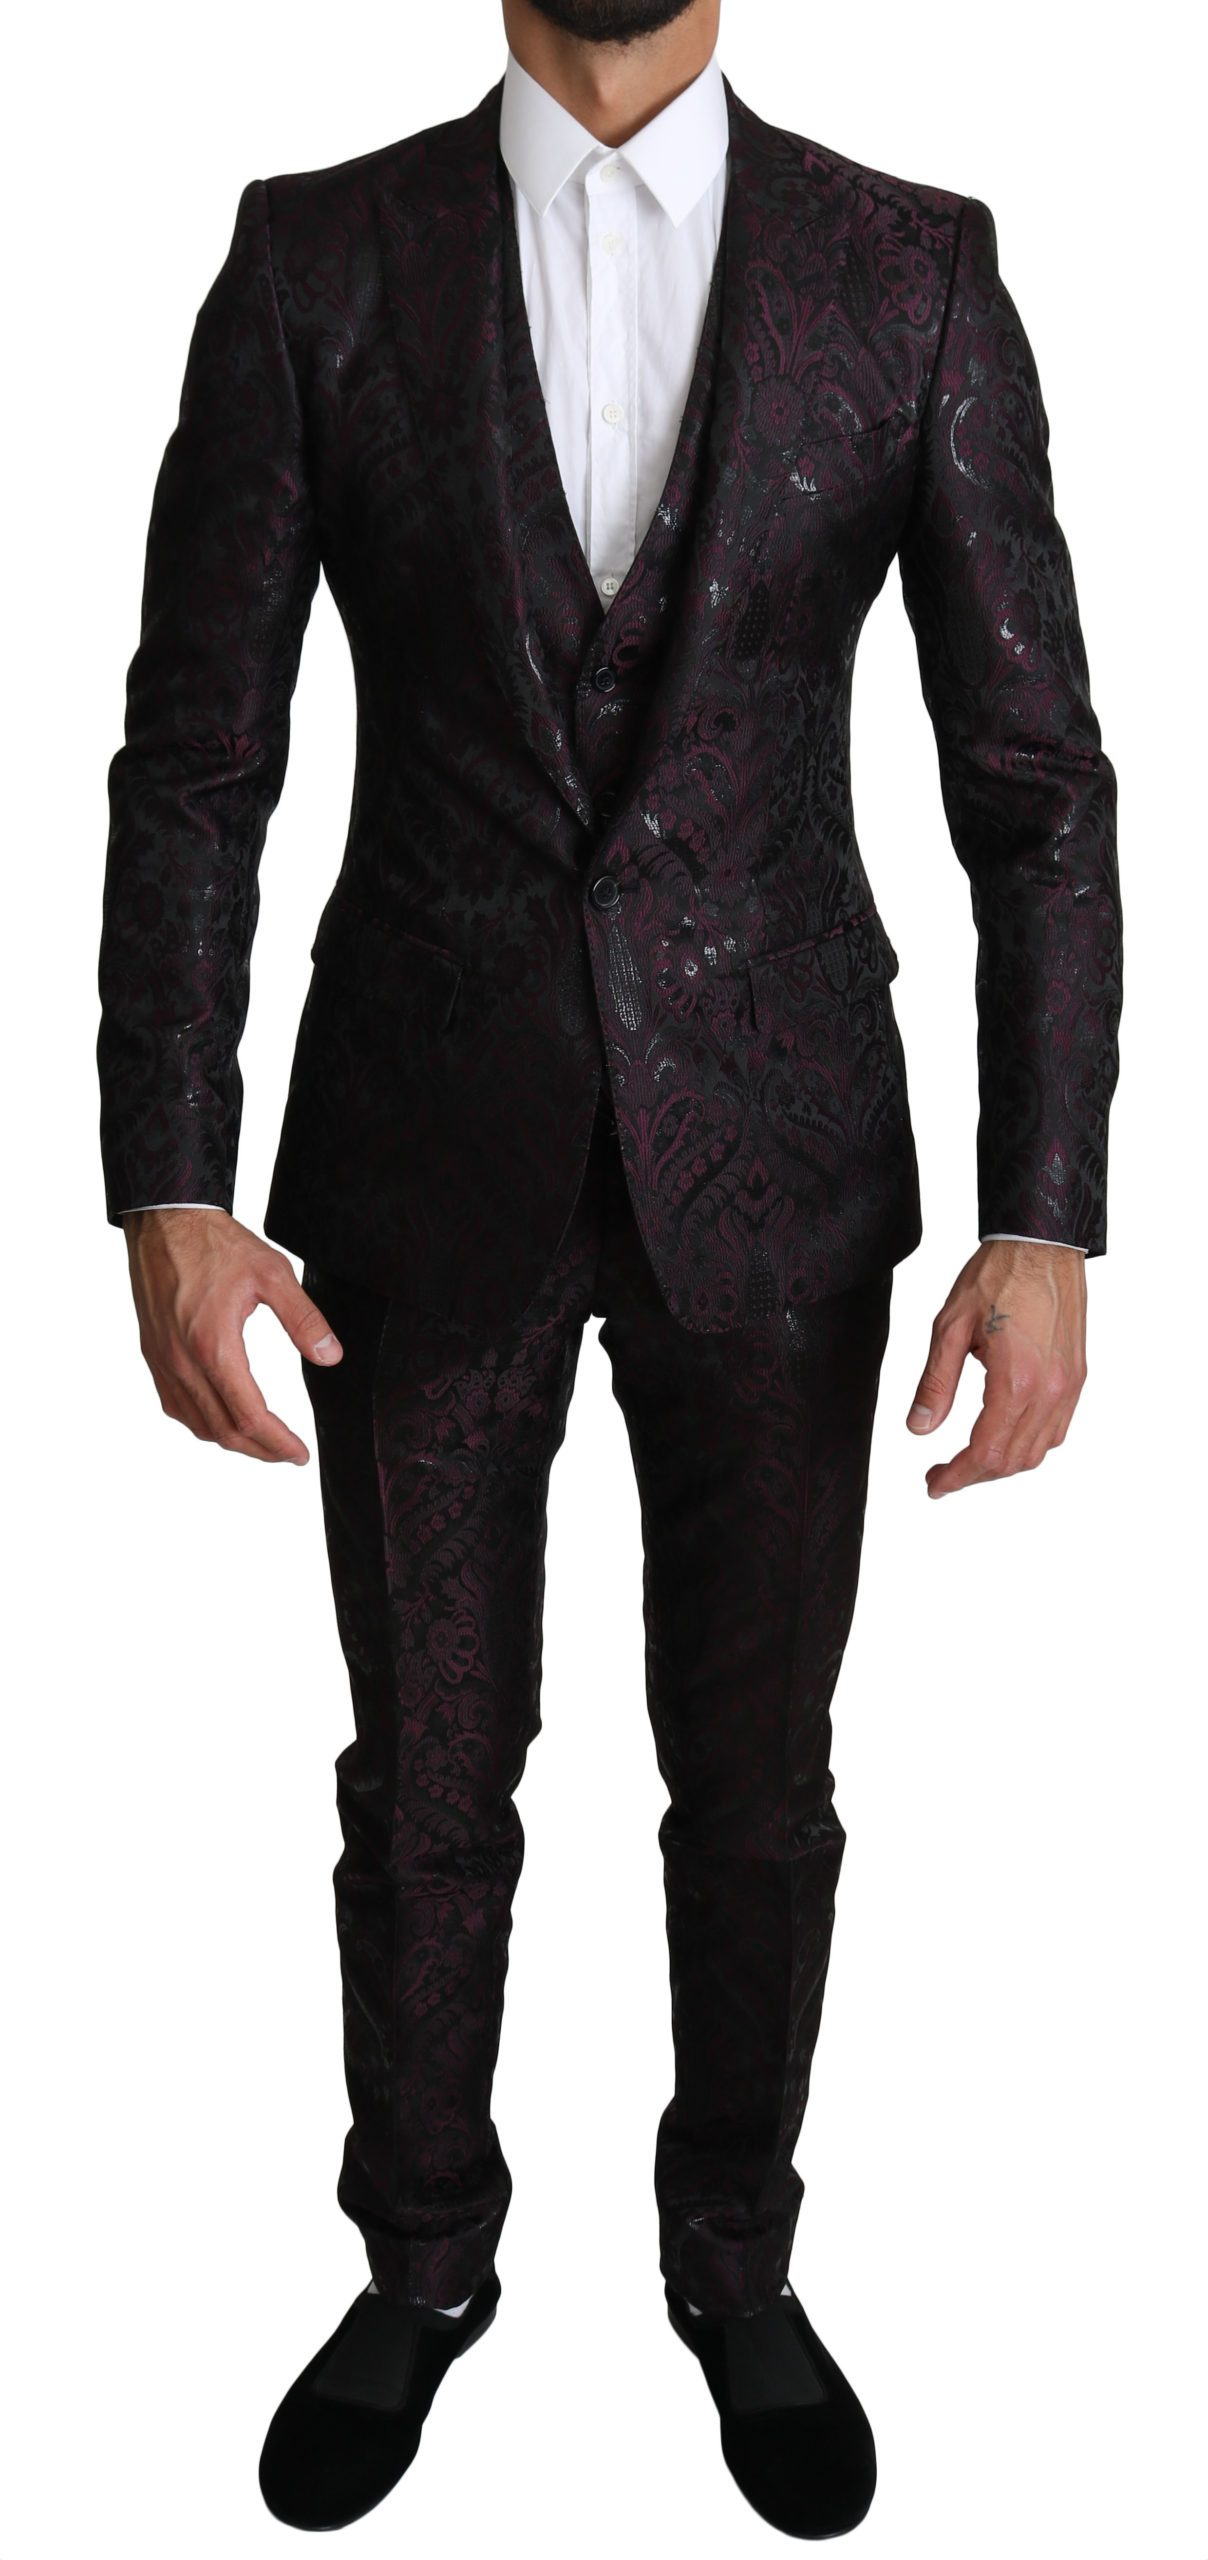 Dolce & Gabbana Men's Floral Brocade 3 Piece MARTINI Suit Purple KOS1516 - IT44 | XS